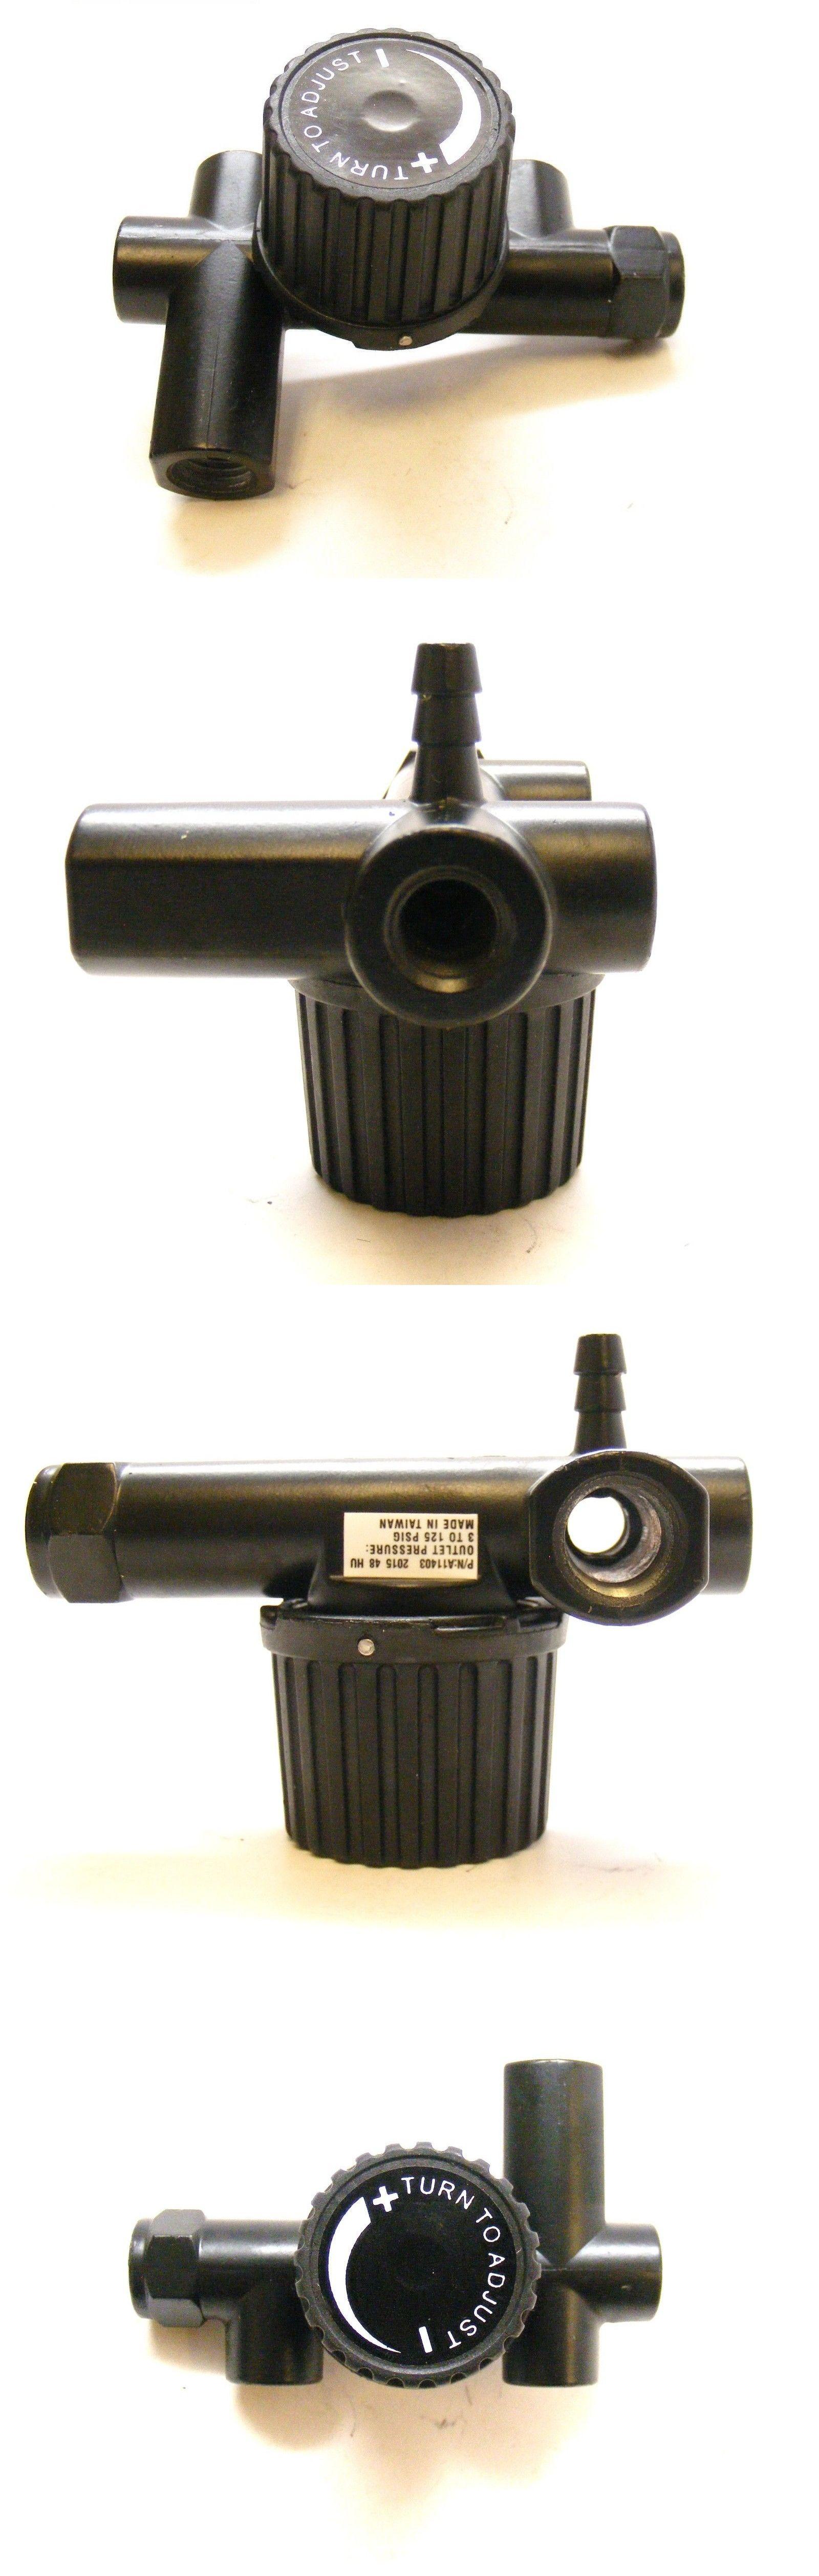 Details about Porter Cable A11403 Regulator 4 Port